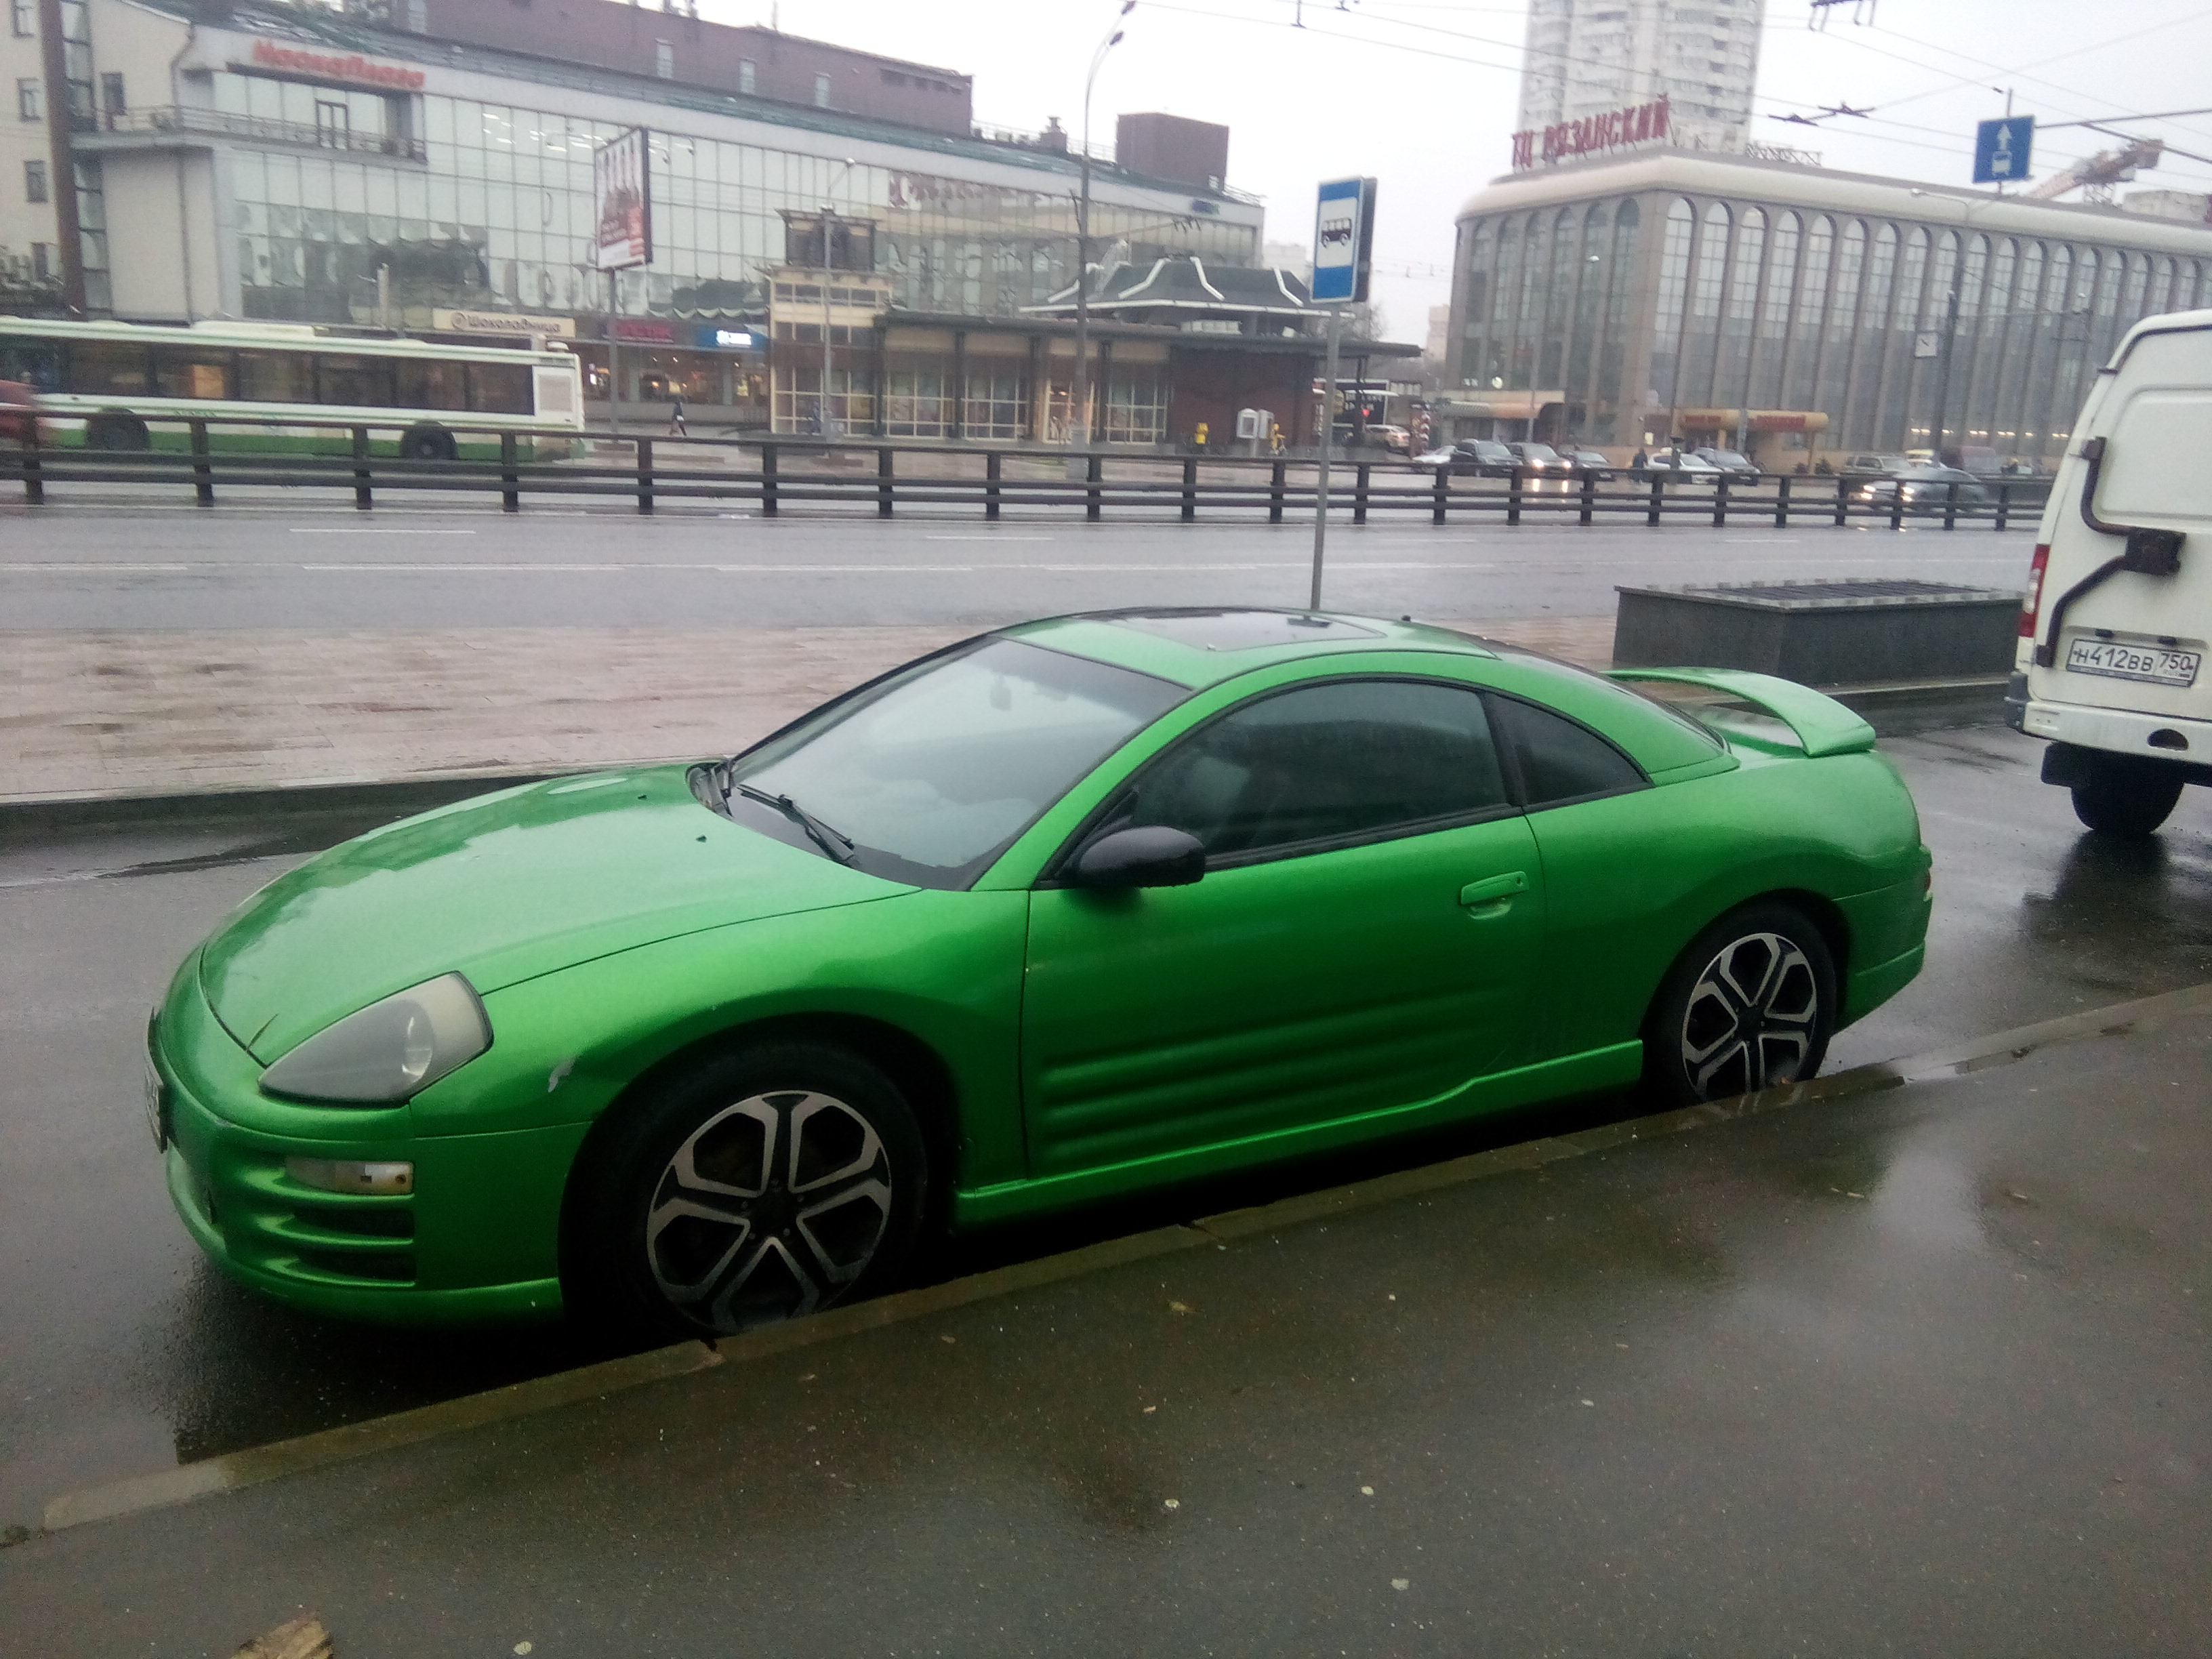 http://s8.uploads.ru/Bz6oN.jpg